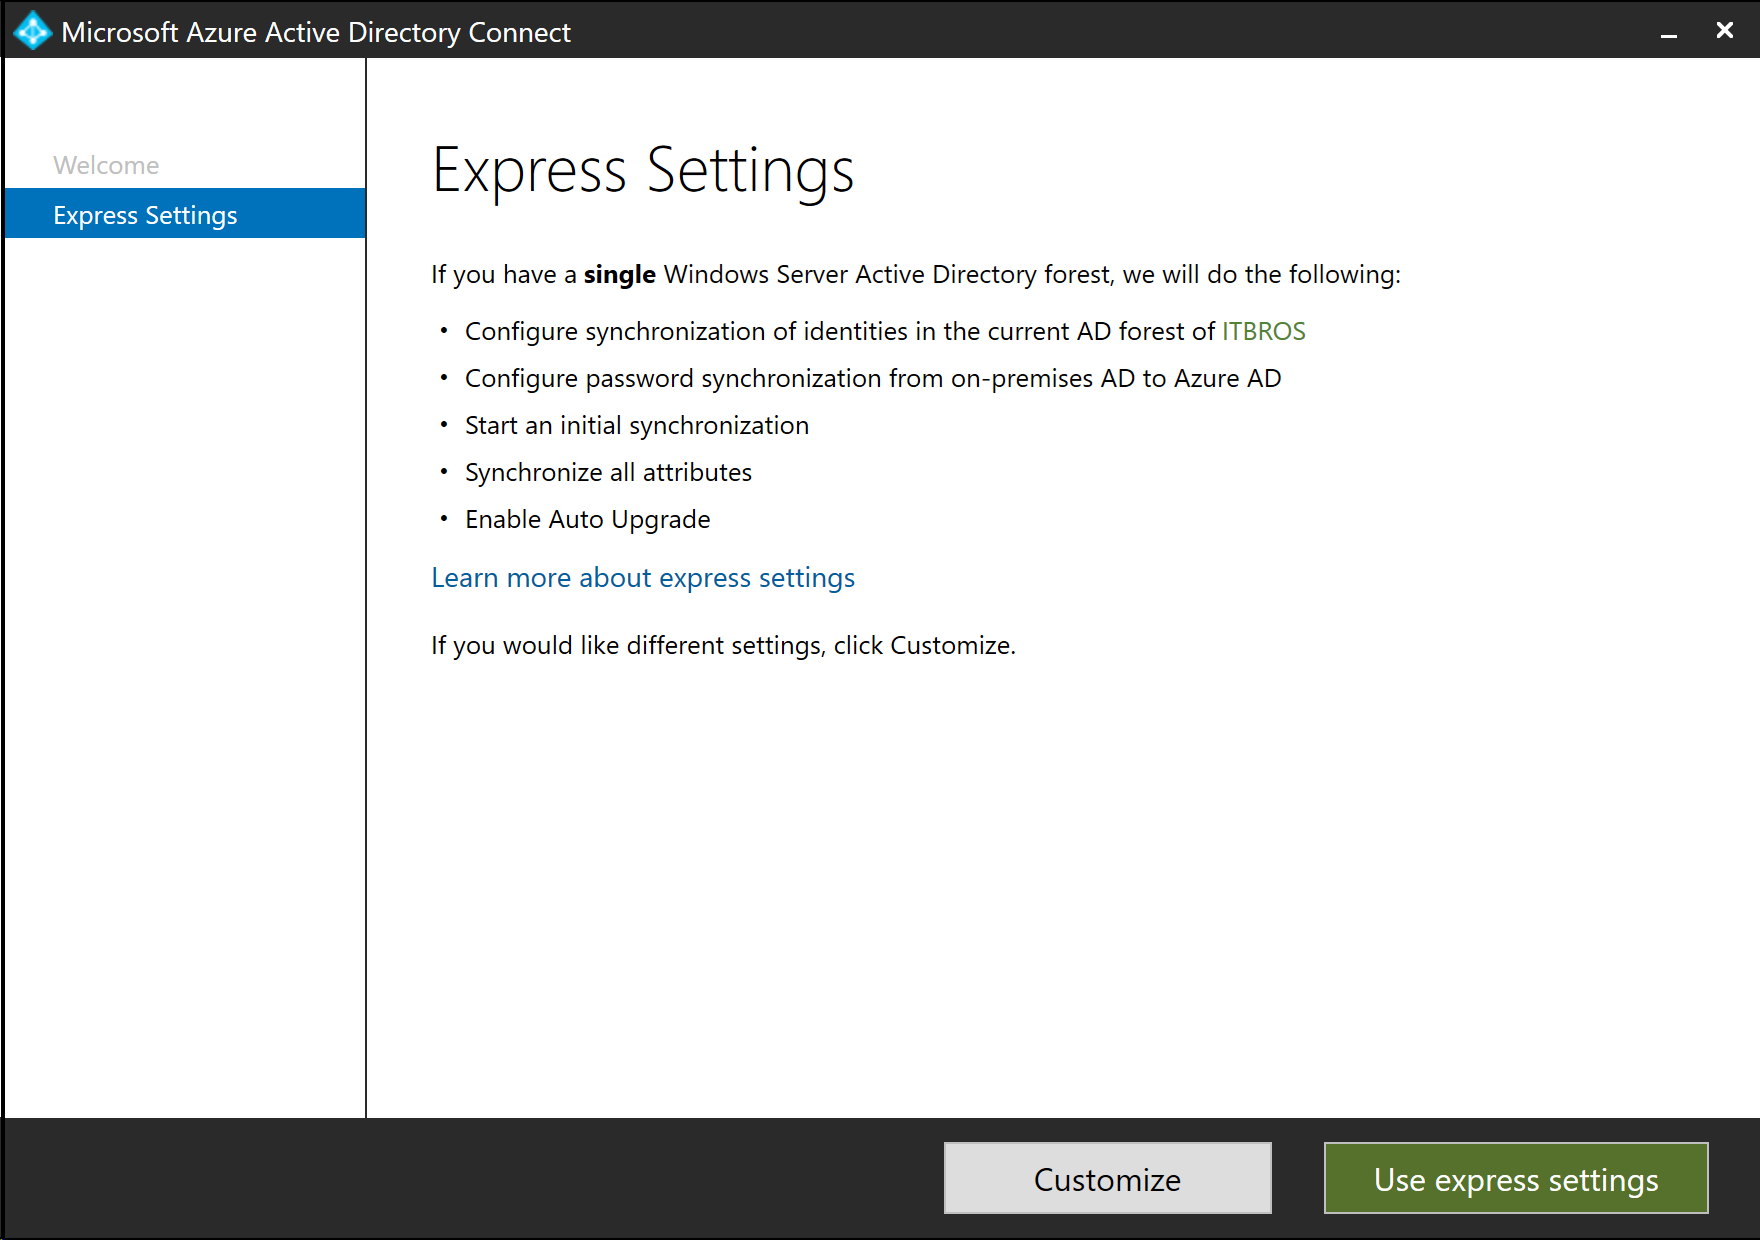 Microsoft Azure Active Directory Connect - Express Settings (click for original screenshot)